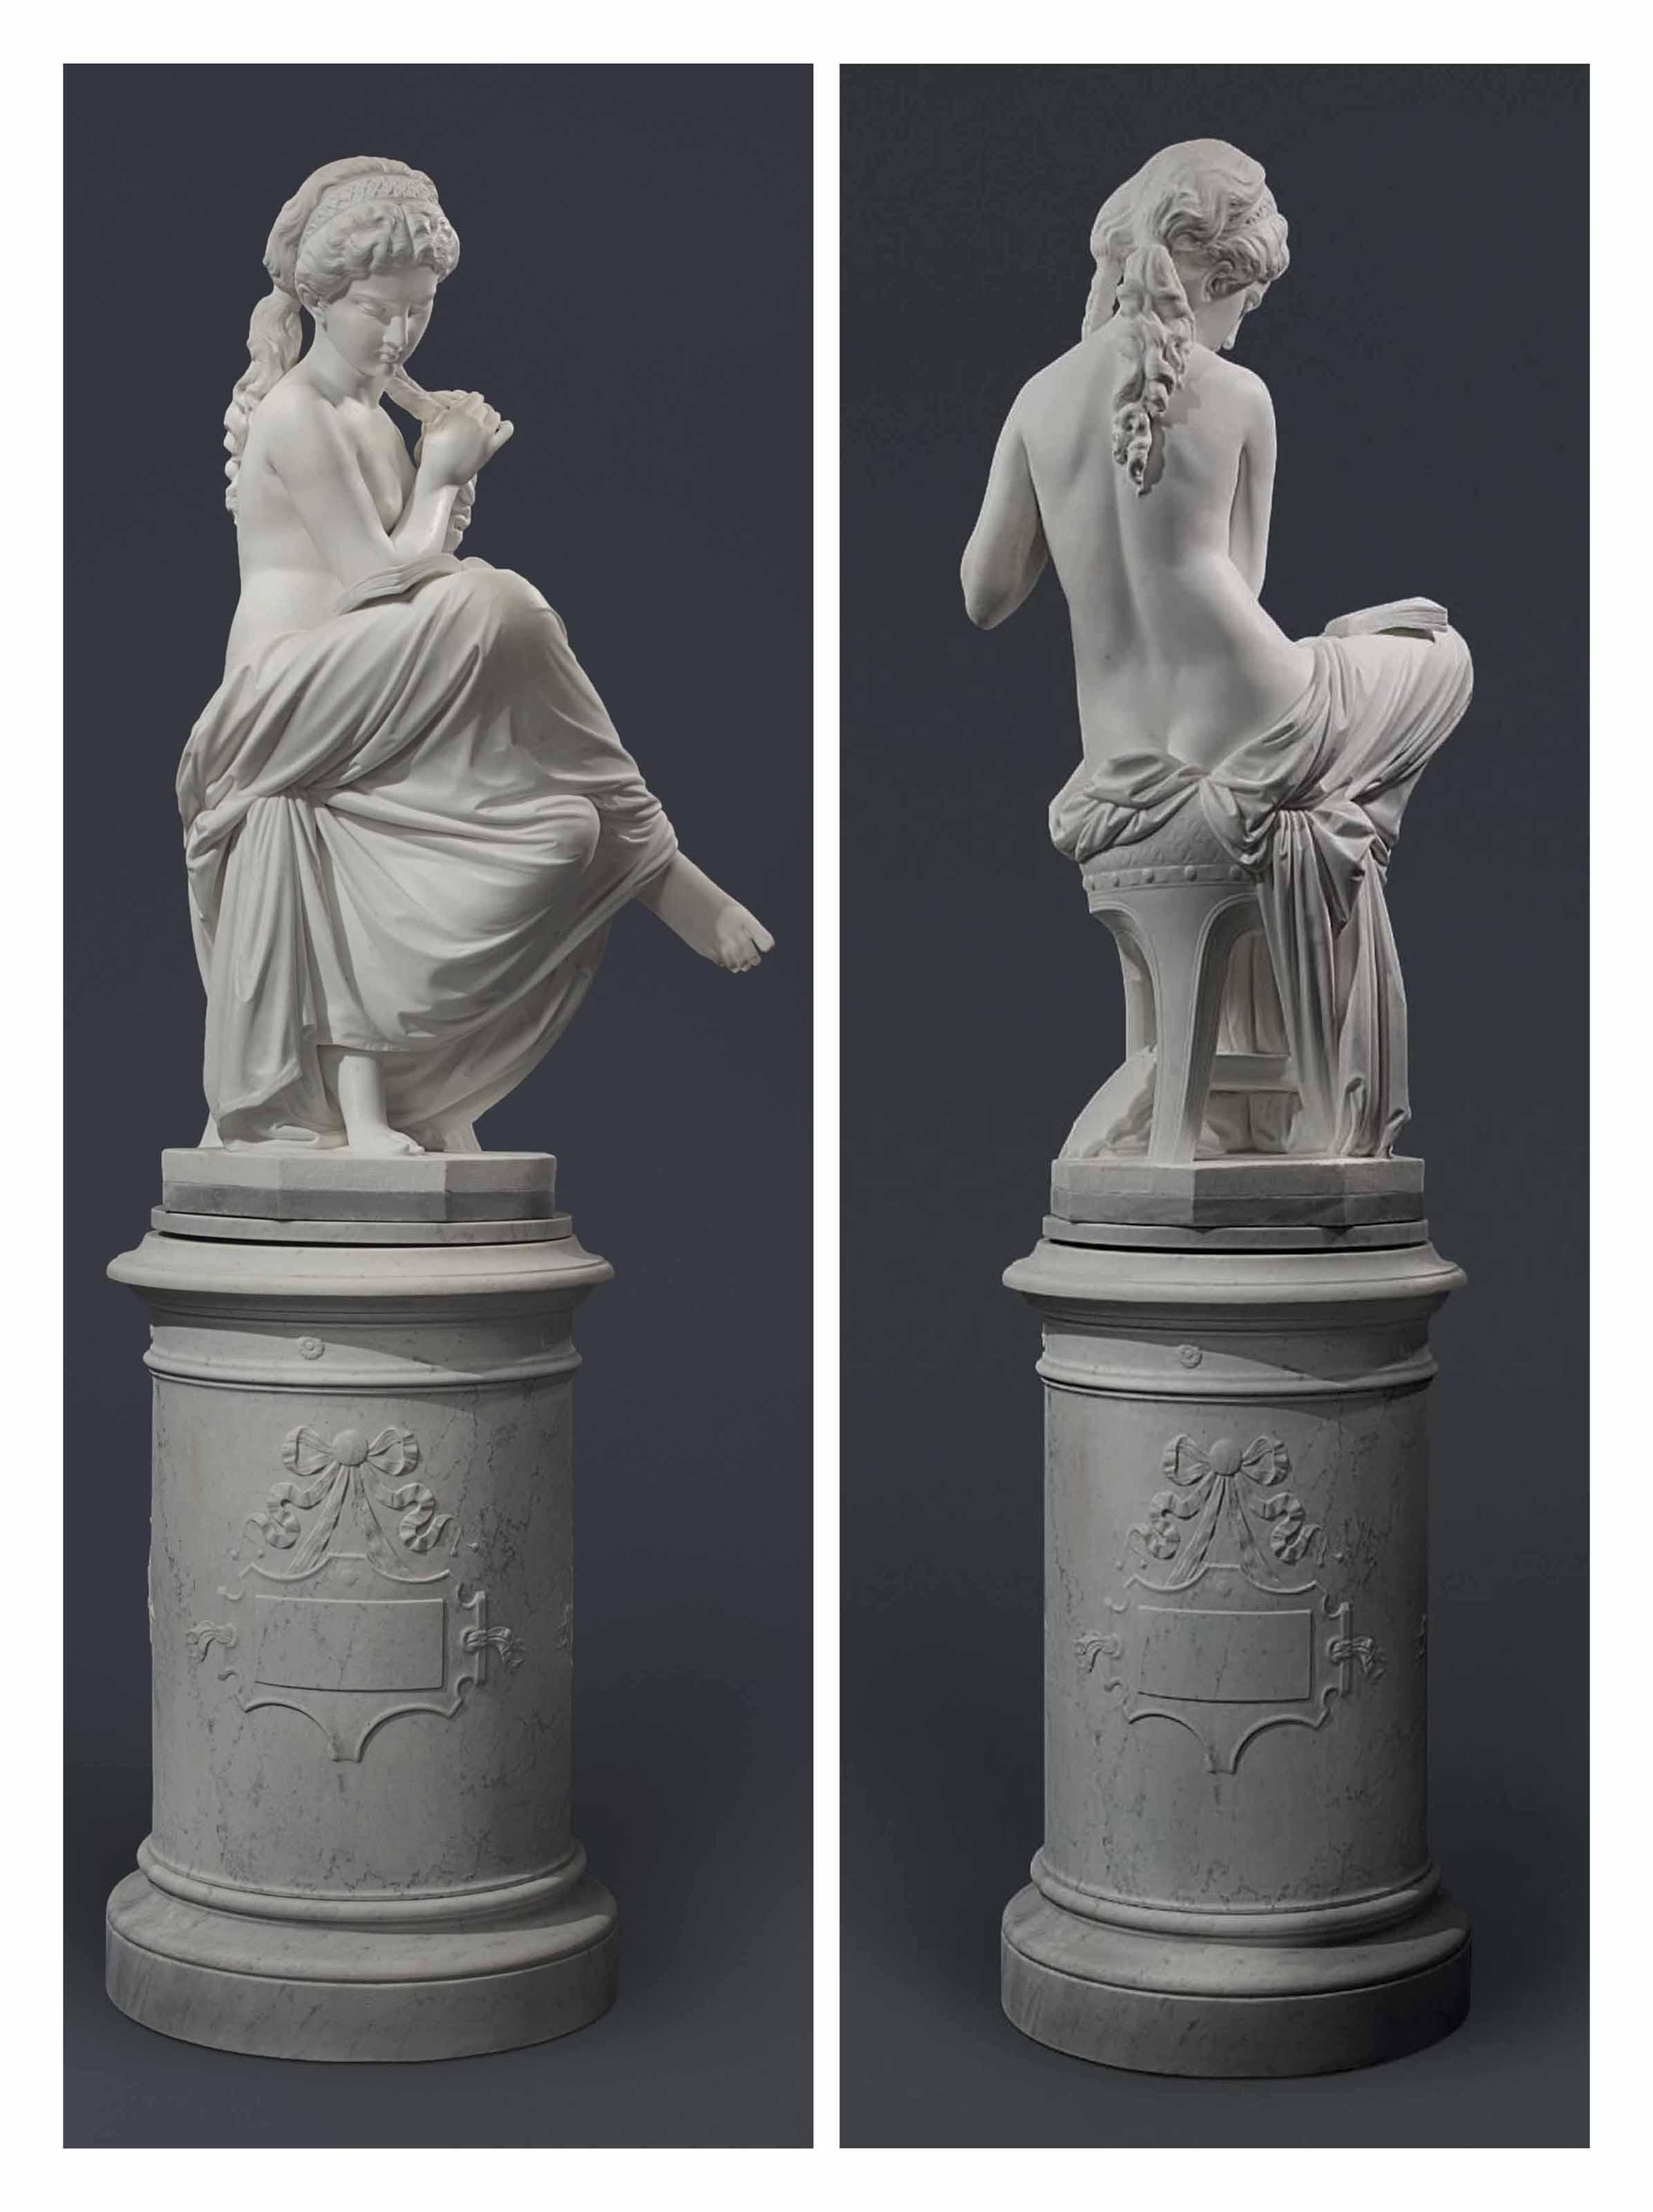 the italian lotfinder lot girl antonio sculpture b for sculptures pedestal reading rossetti details nyr